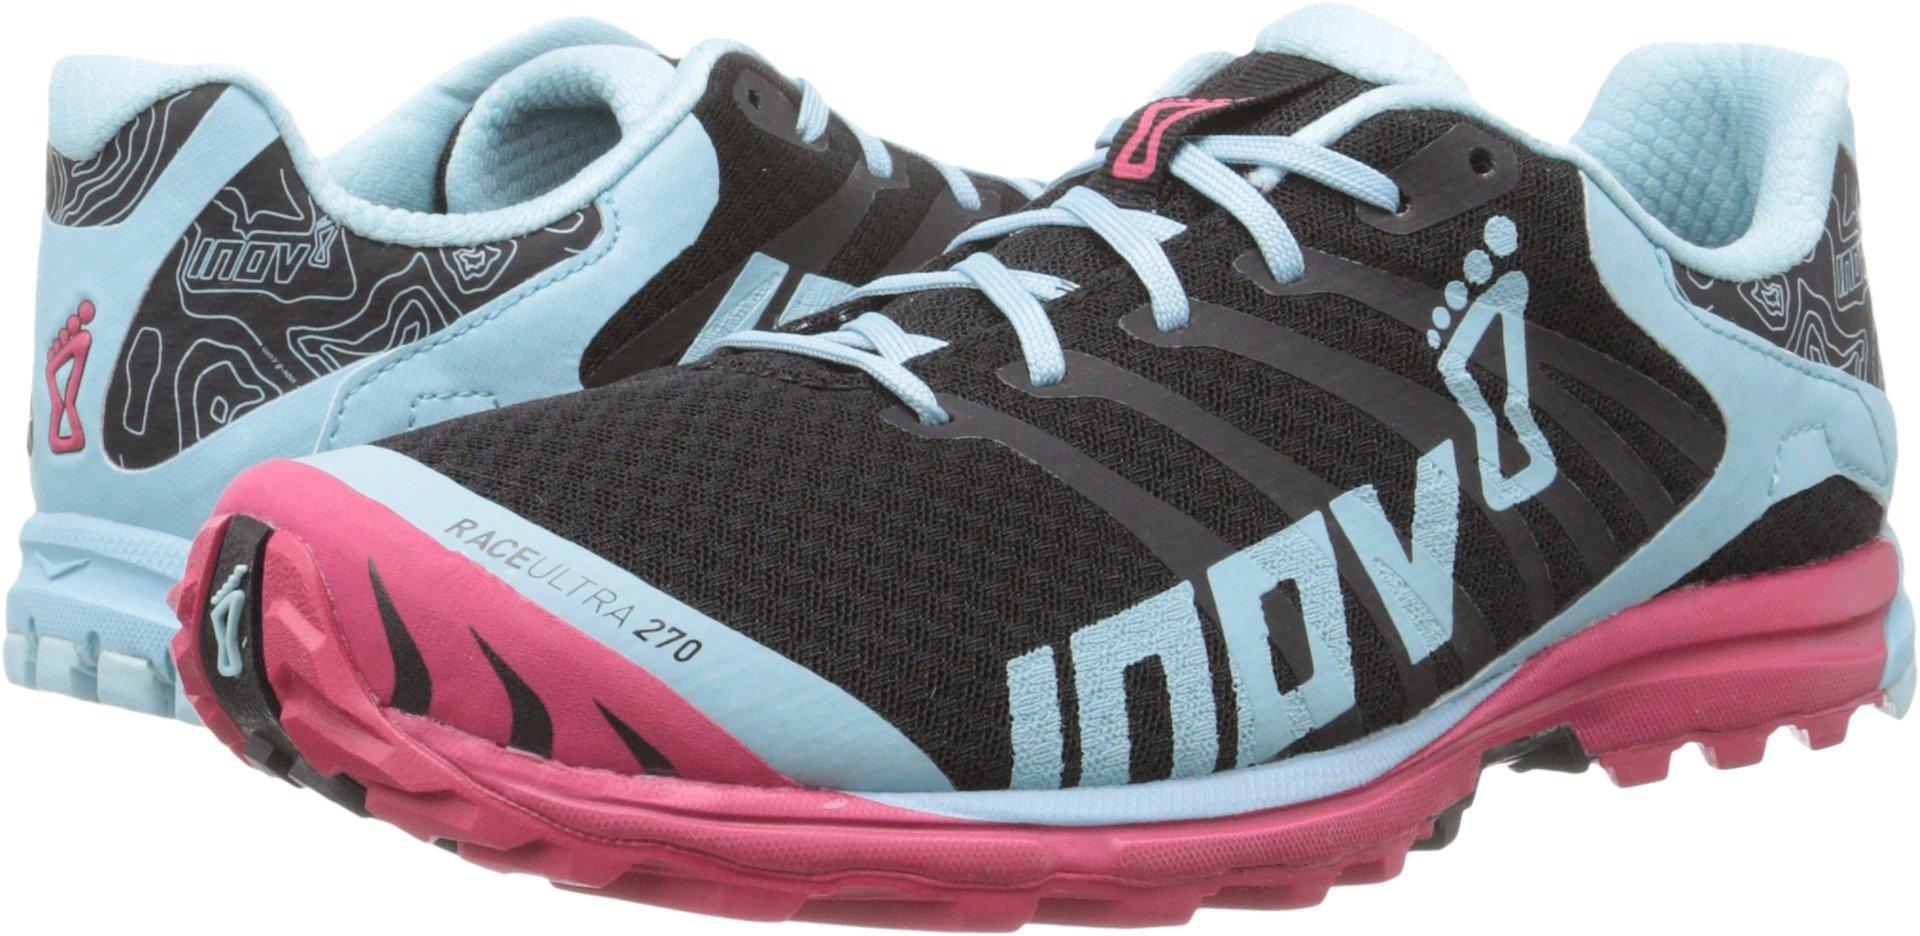 Inov-8 Women's Race Ultra 270 Trail Running Shoe, Black/Blue/Berry, 10.5 B US